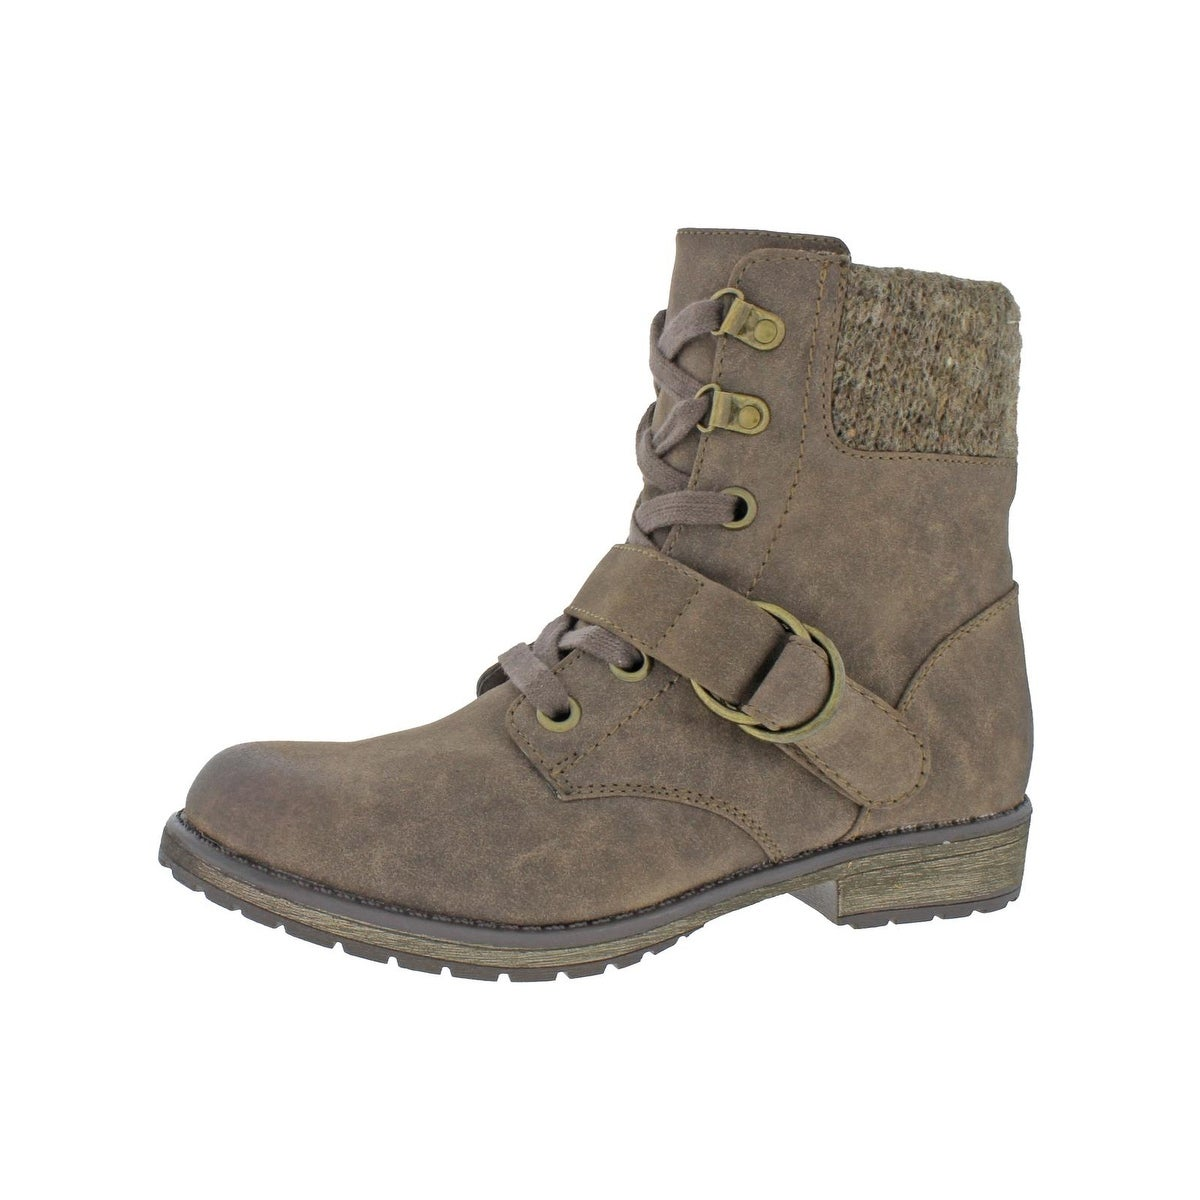 Shop Roxy Womens Davie Ankle Boots Lace